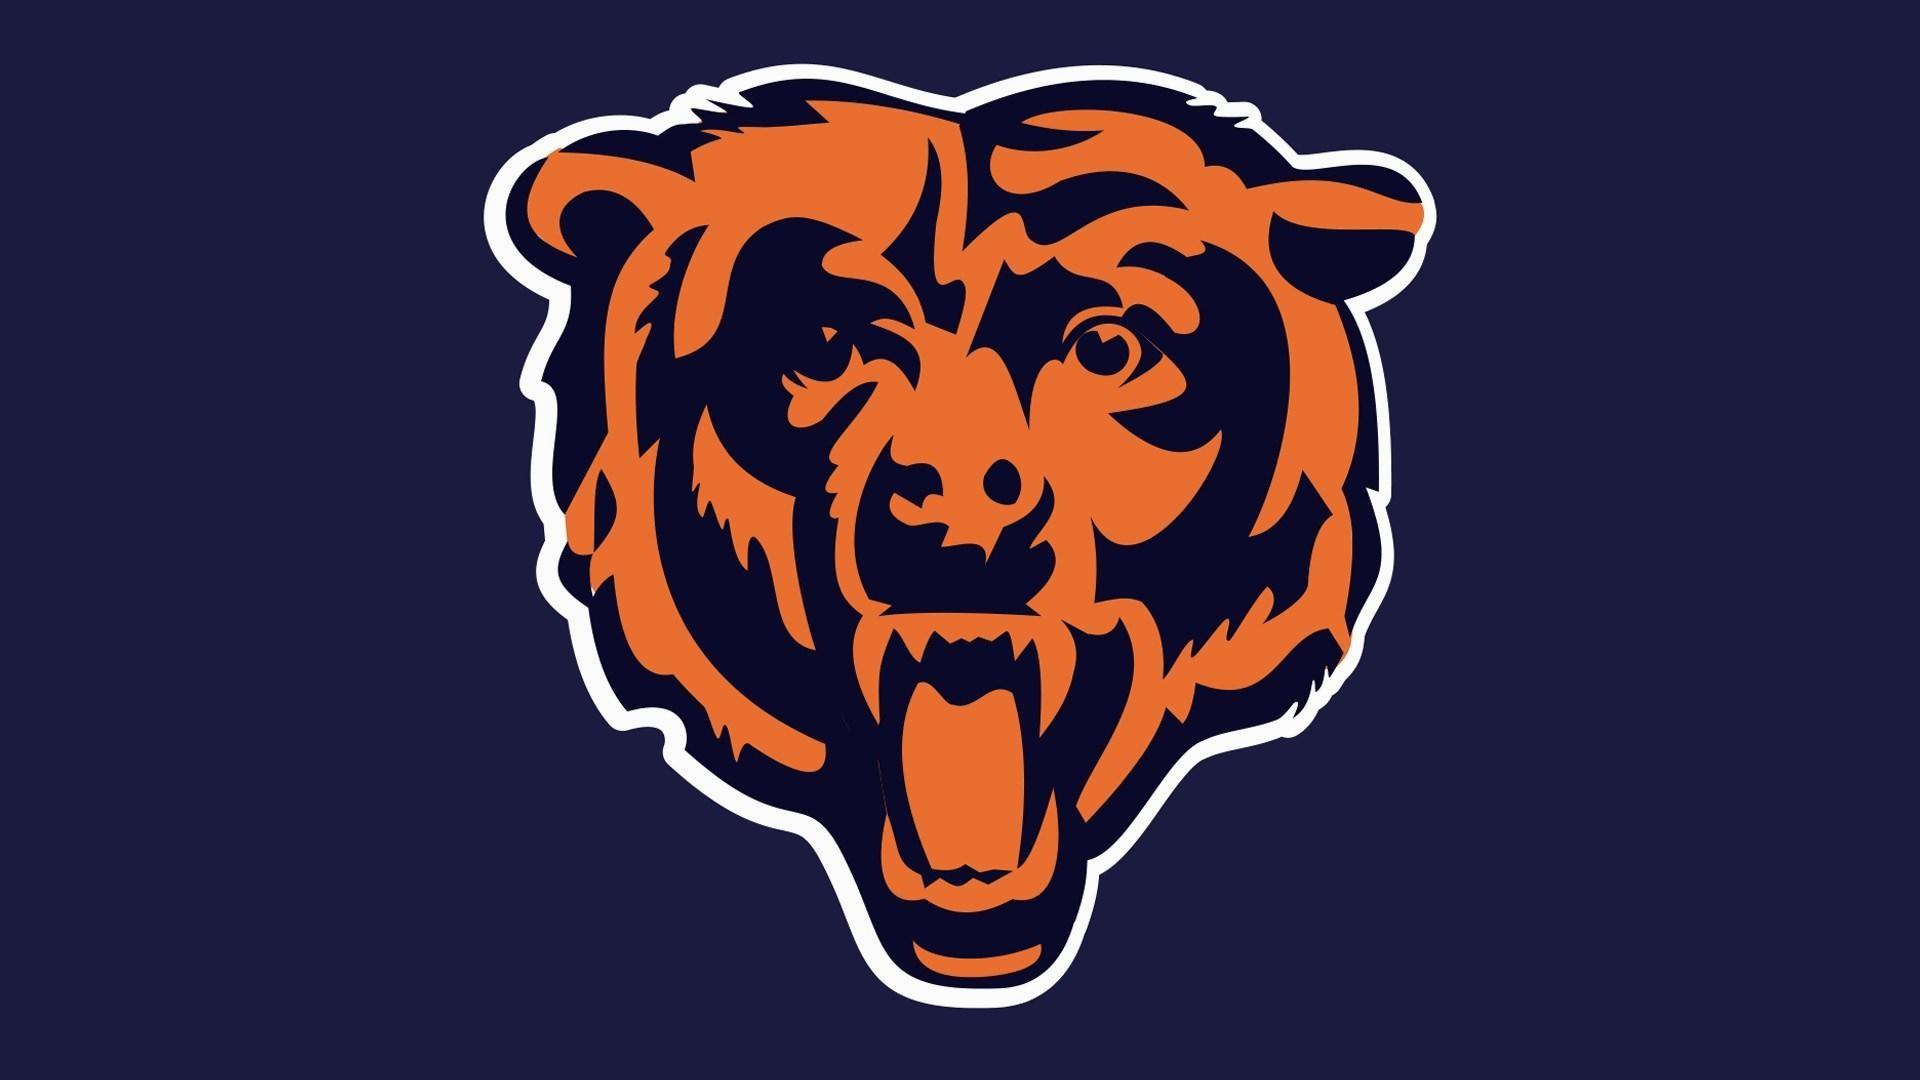 chicago-bears-backgrounds-for-laptop-wallpaper-wp2003656